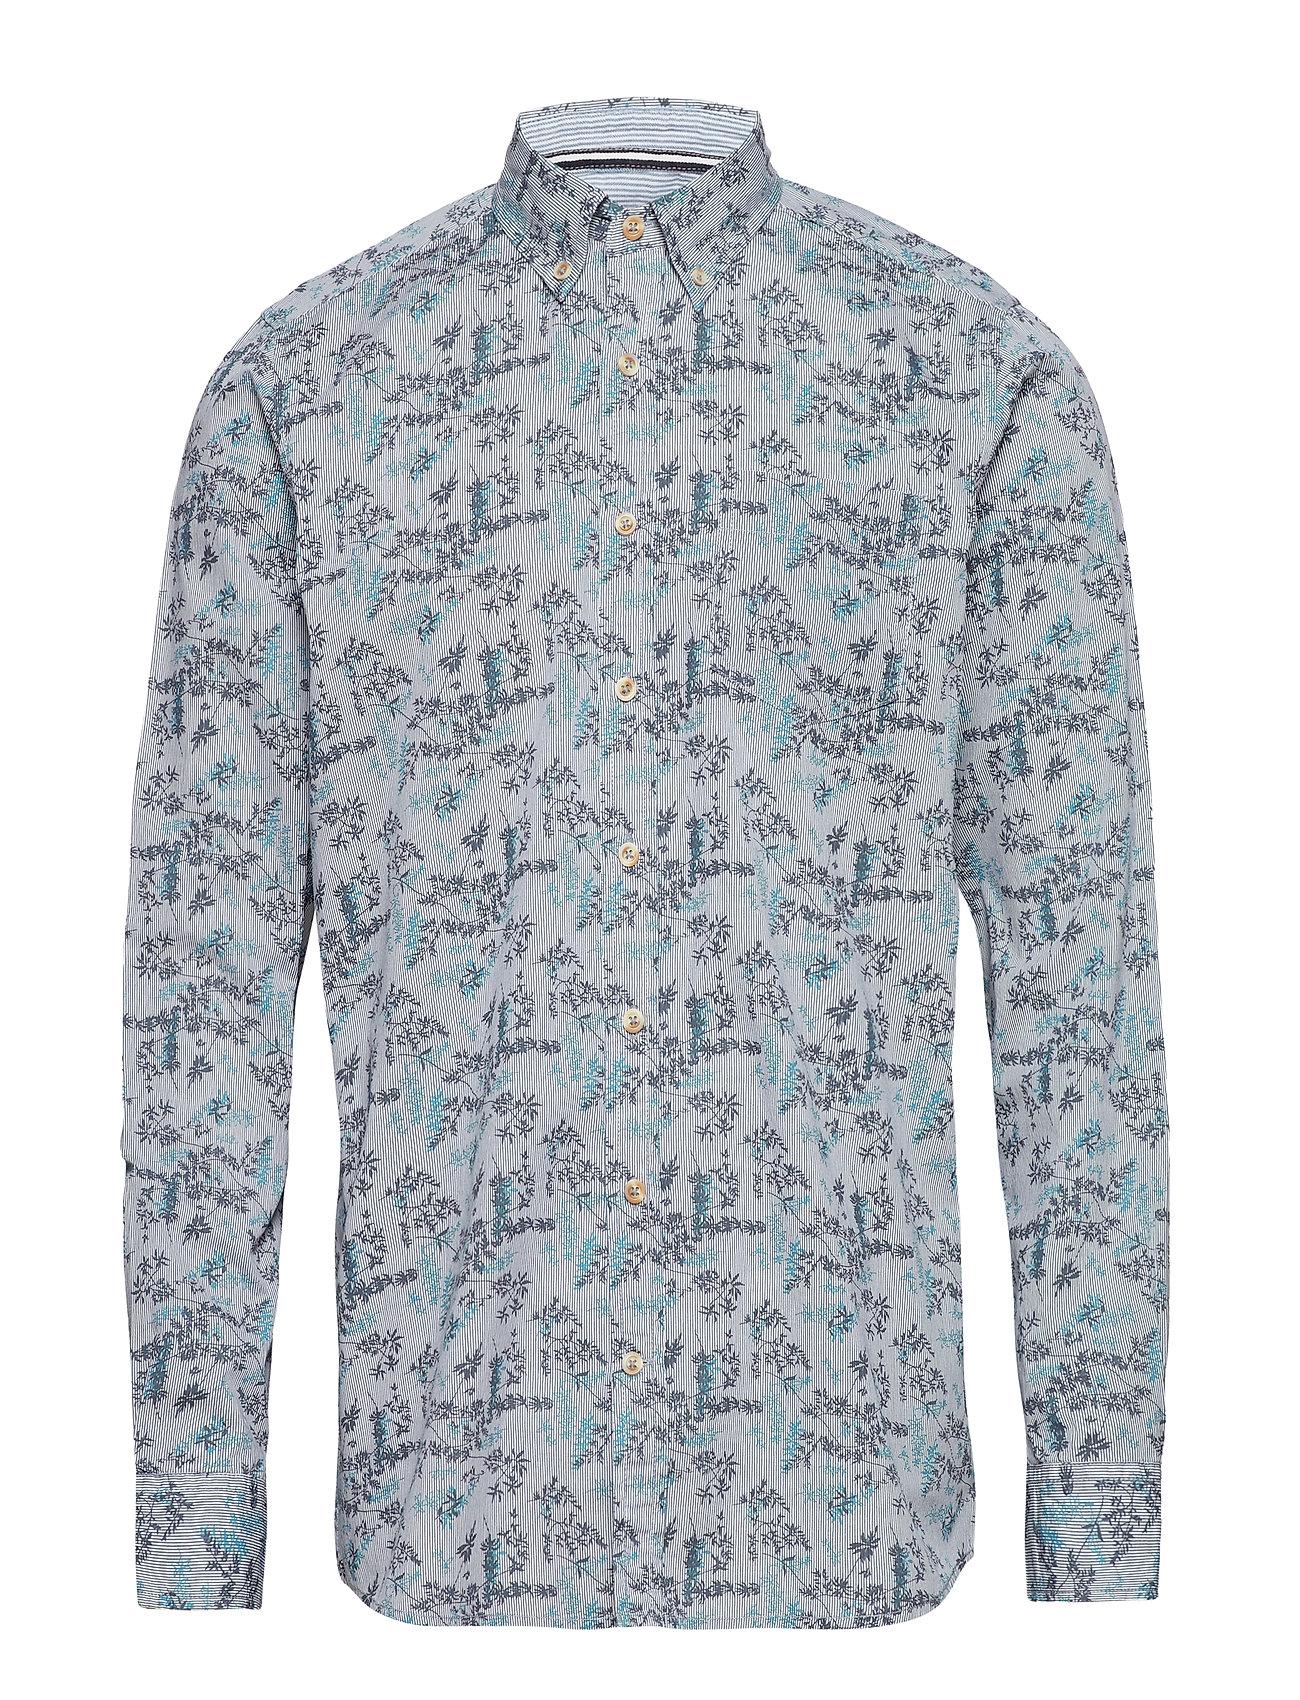 Signal L/S Shirts - INDIGO MOOD